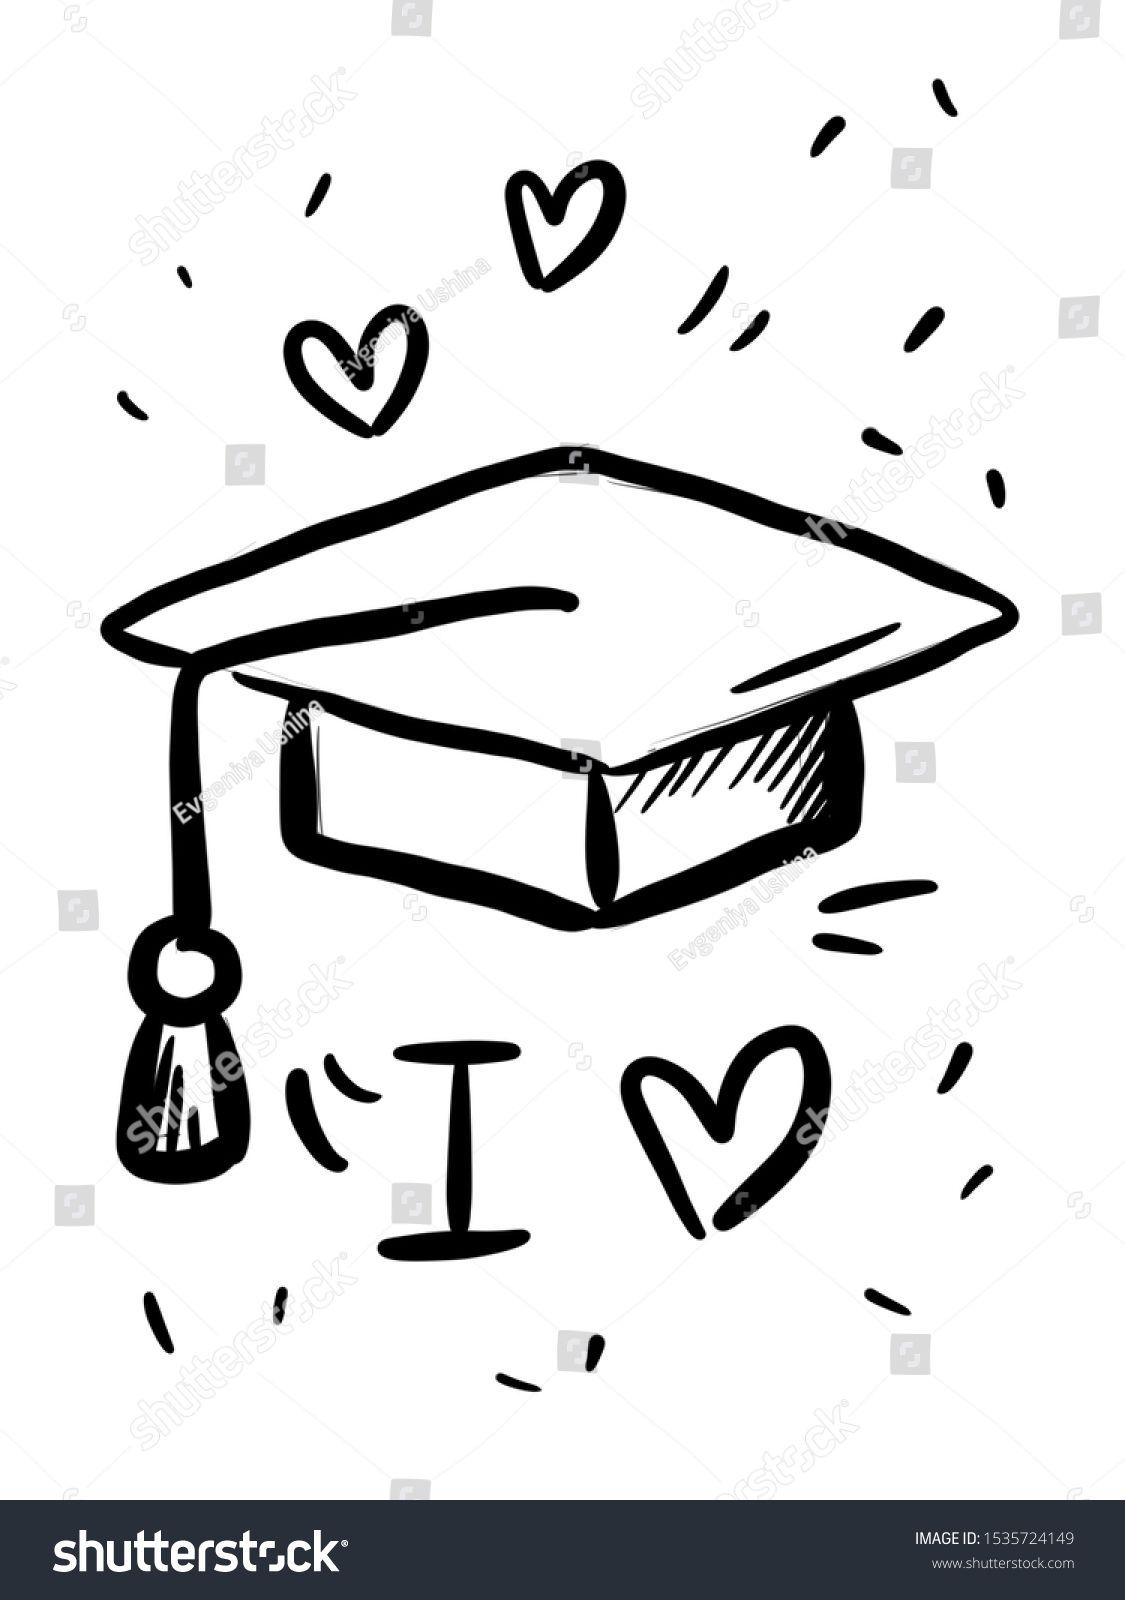 Academic Education Graduation Hat Line Icon Student Graduation Cap Education Icon Academic University Hat Illust Education Icon Graduation Hat Line Icon